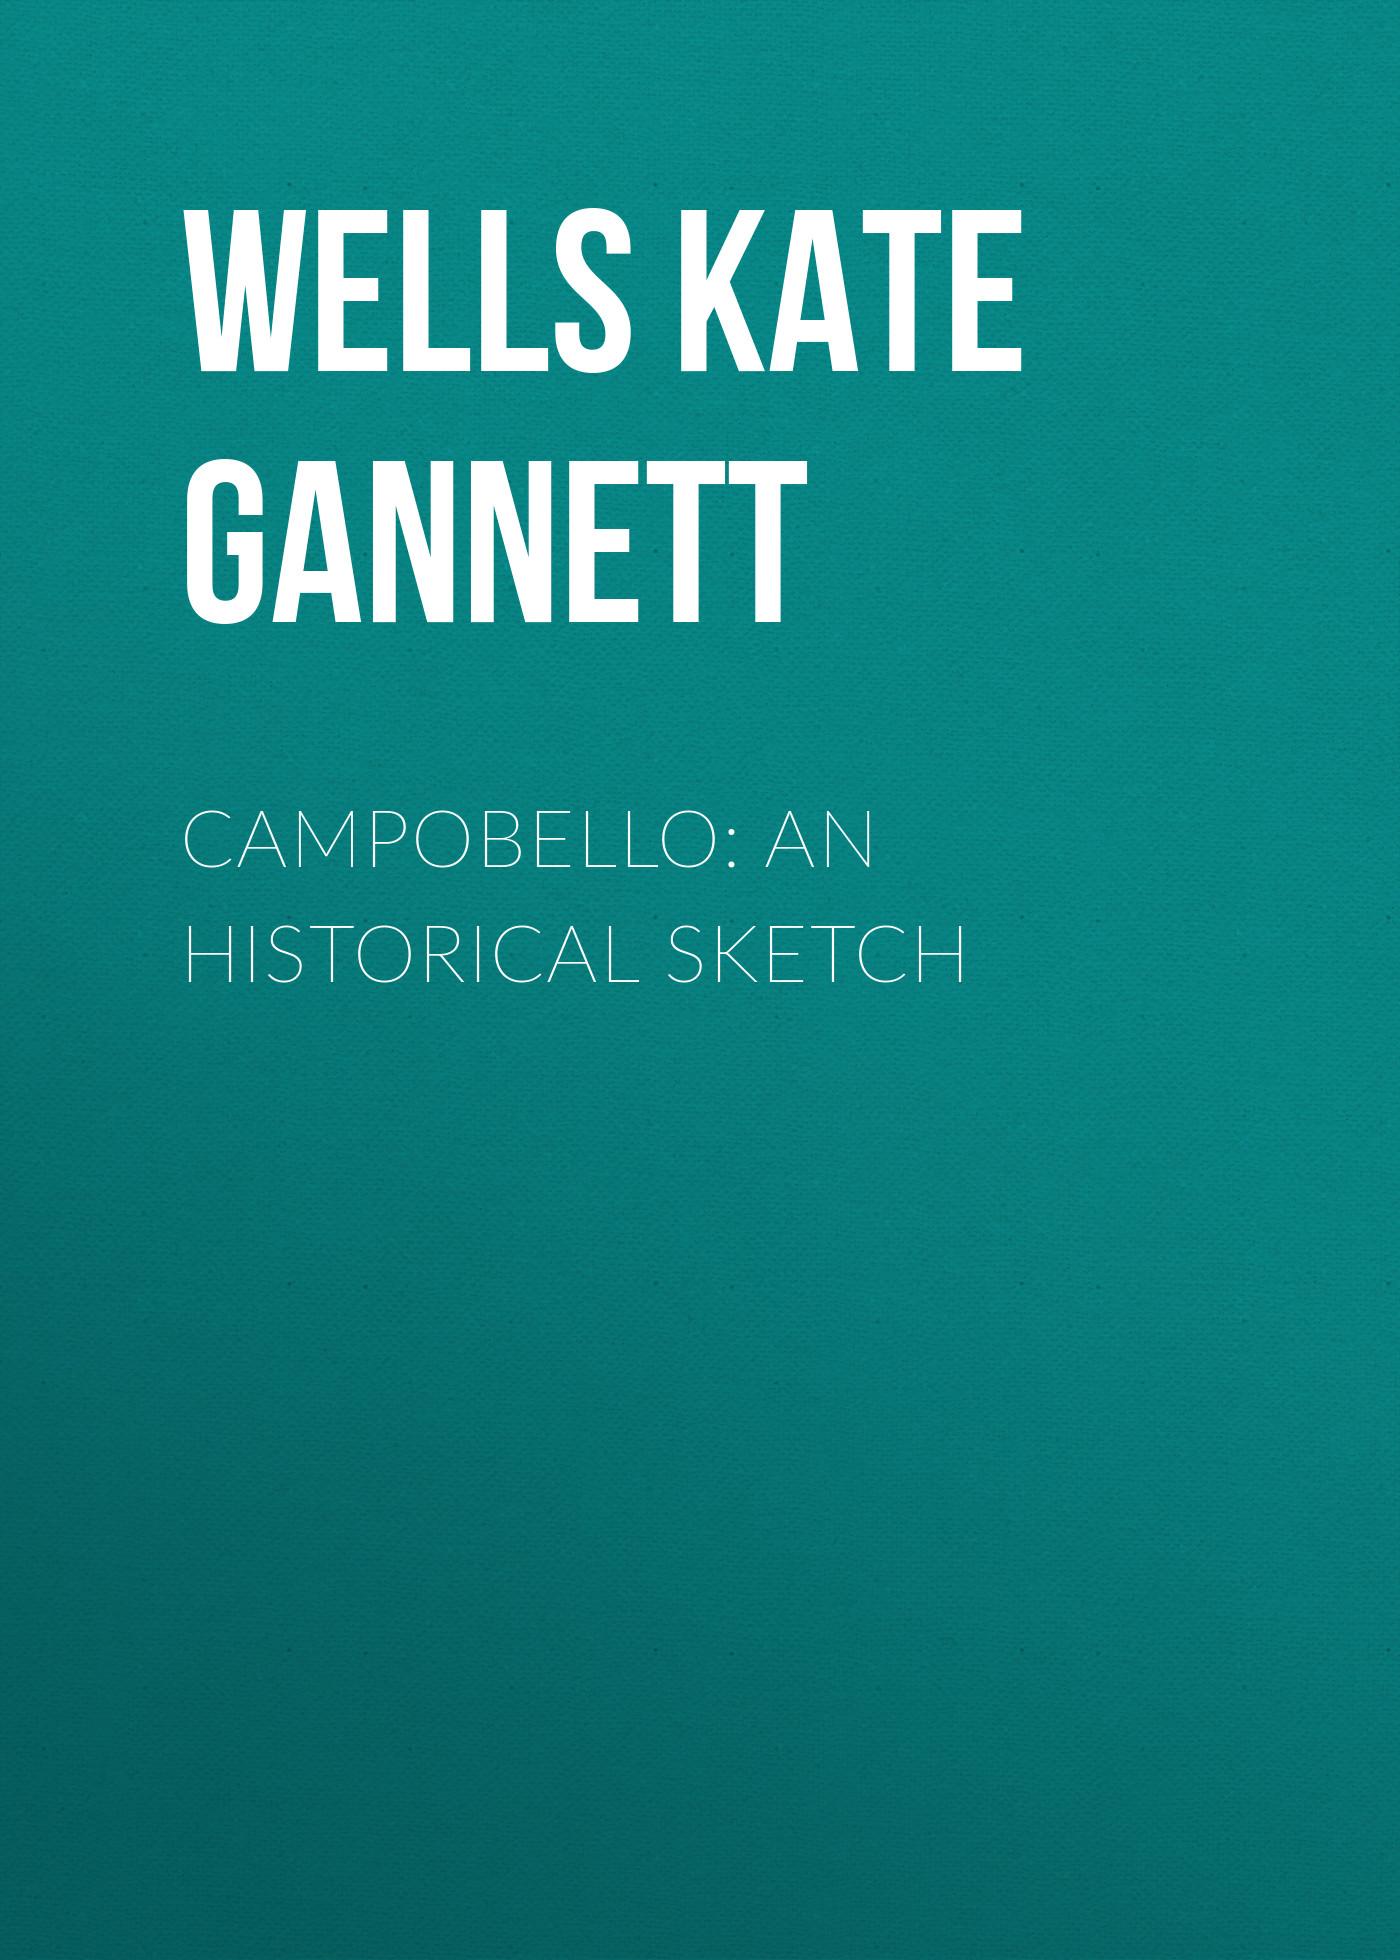 Wells Kate Gannett Campobello: An Historical Sketch